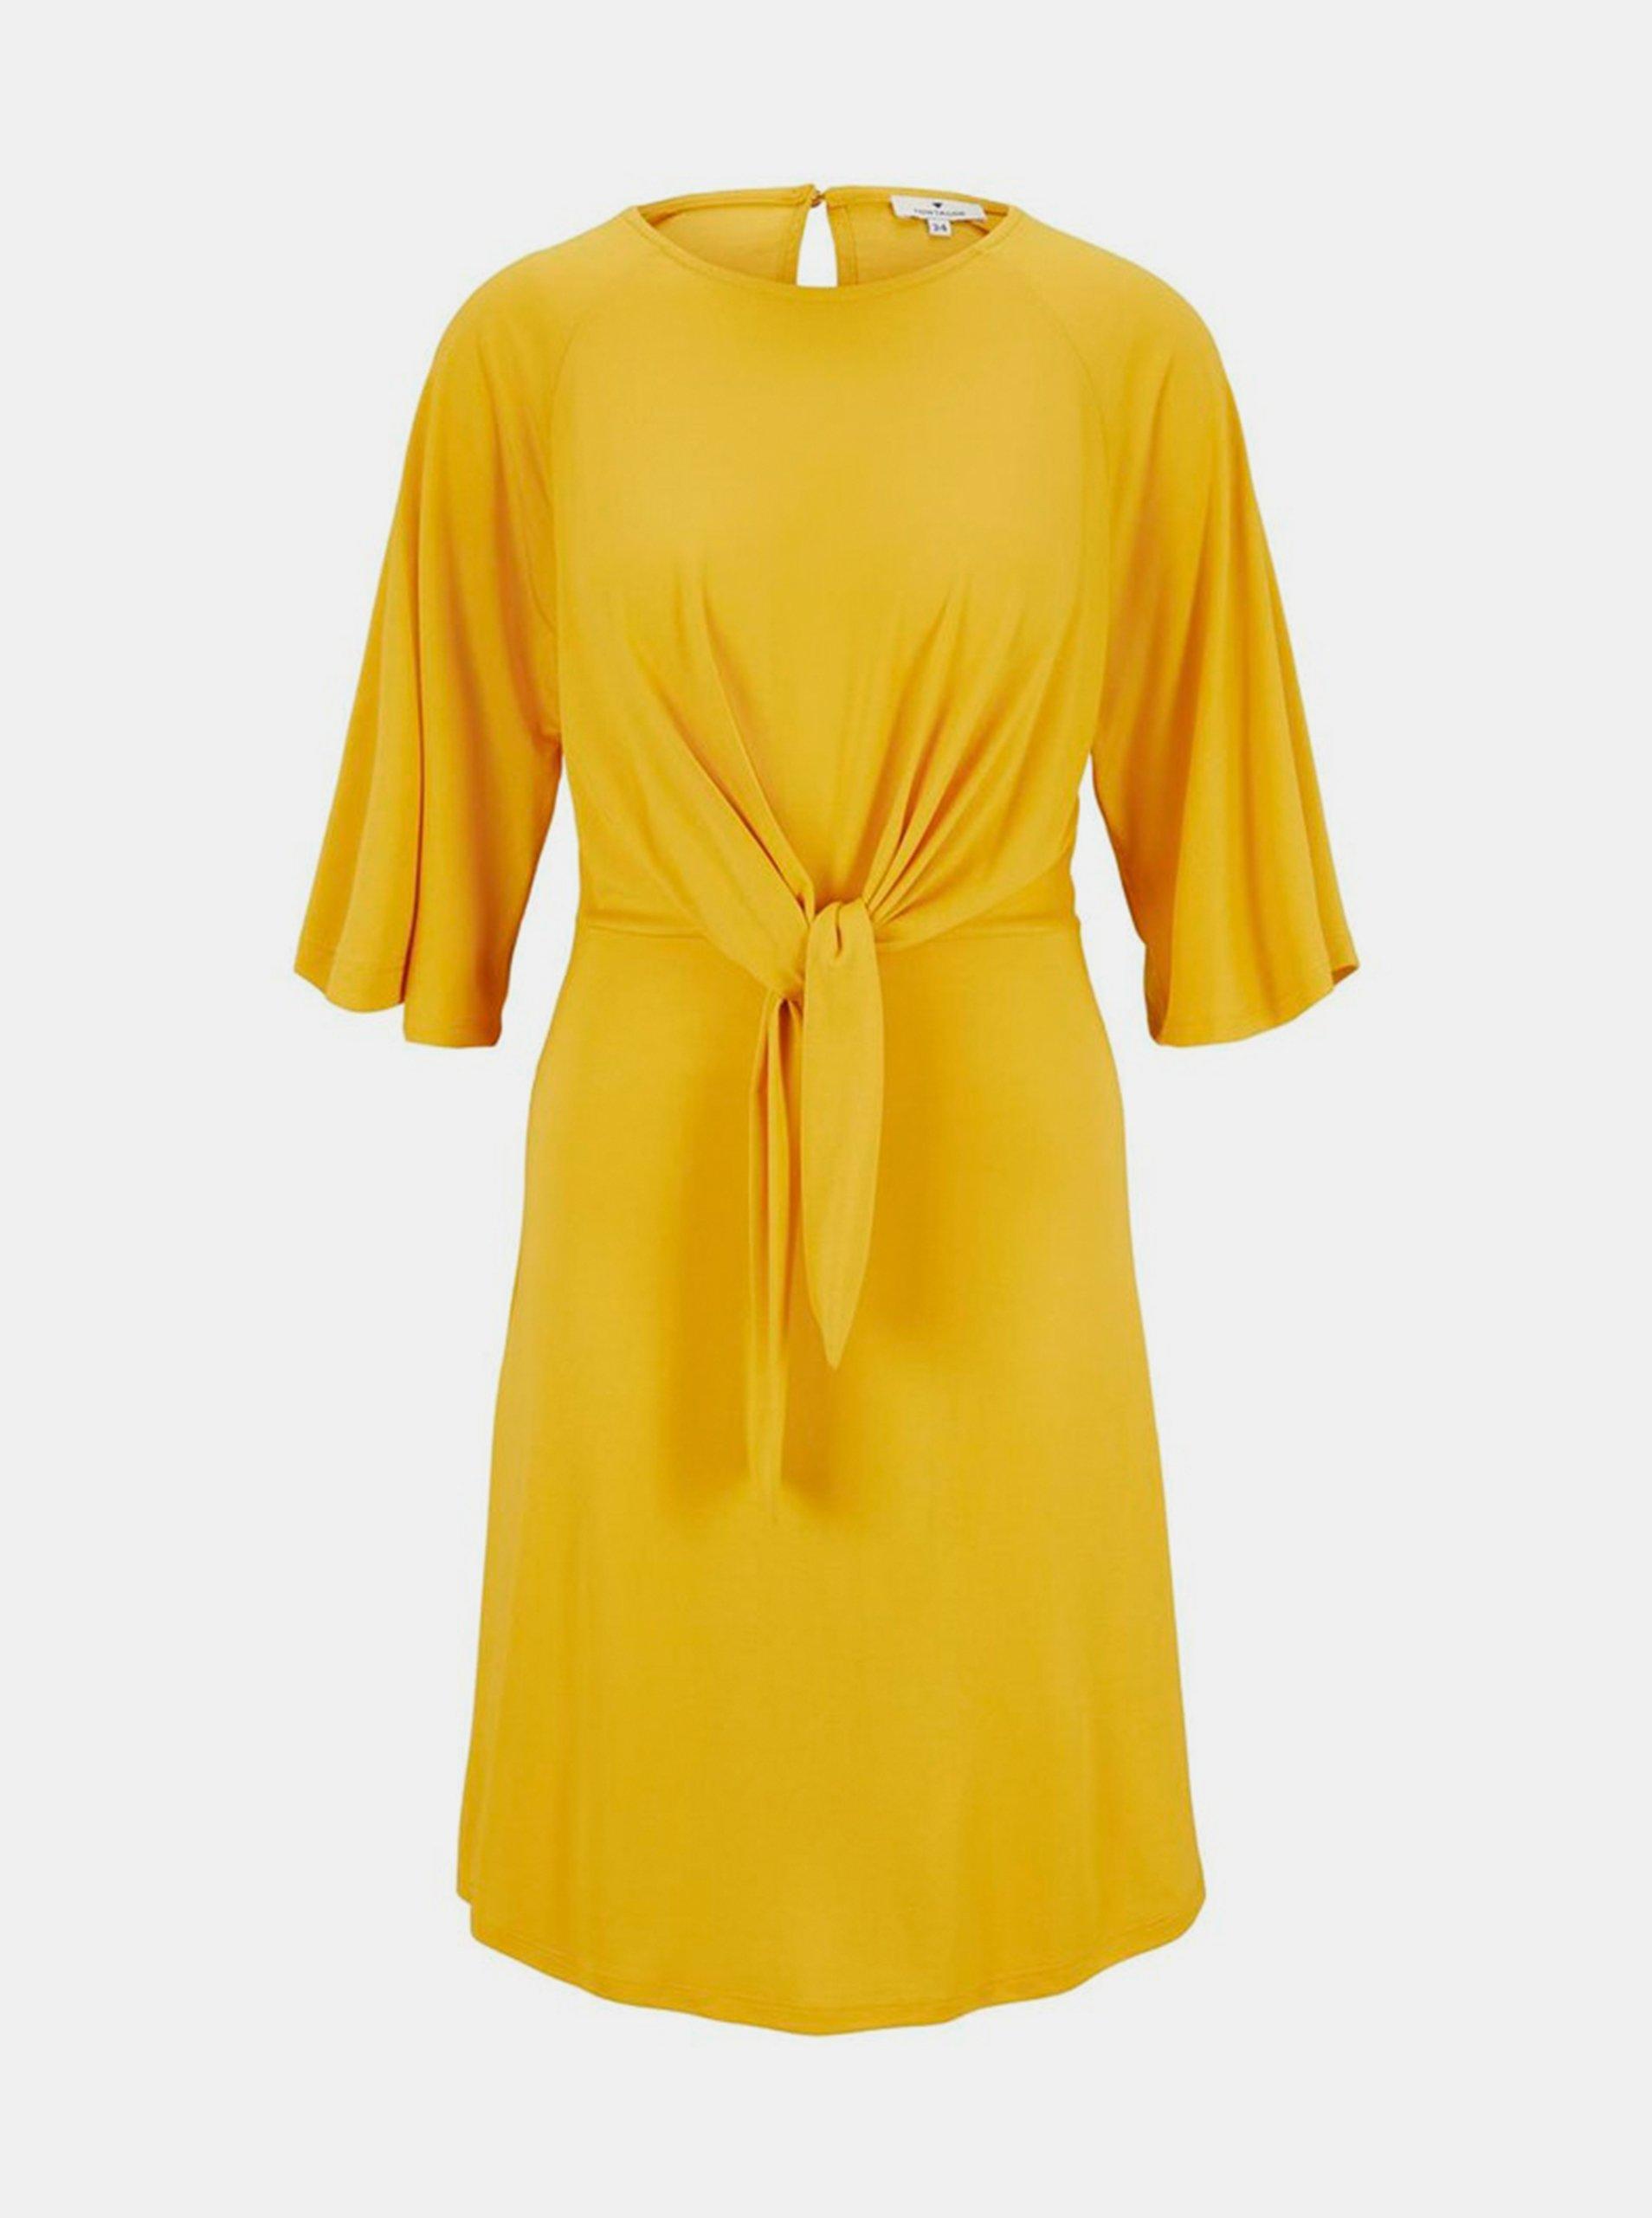 Horčicové dámske šaty Tom Tailor.